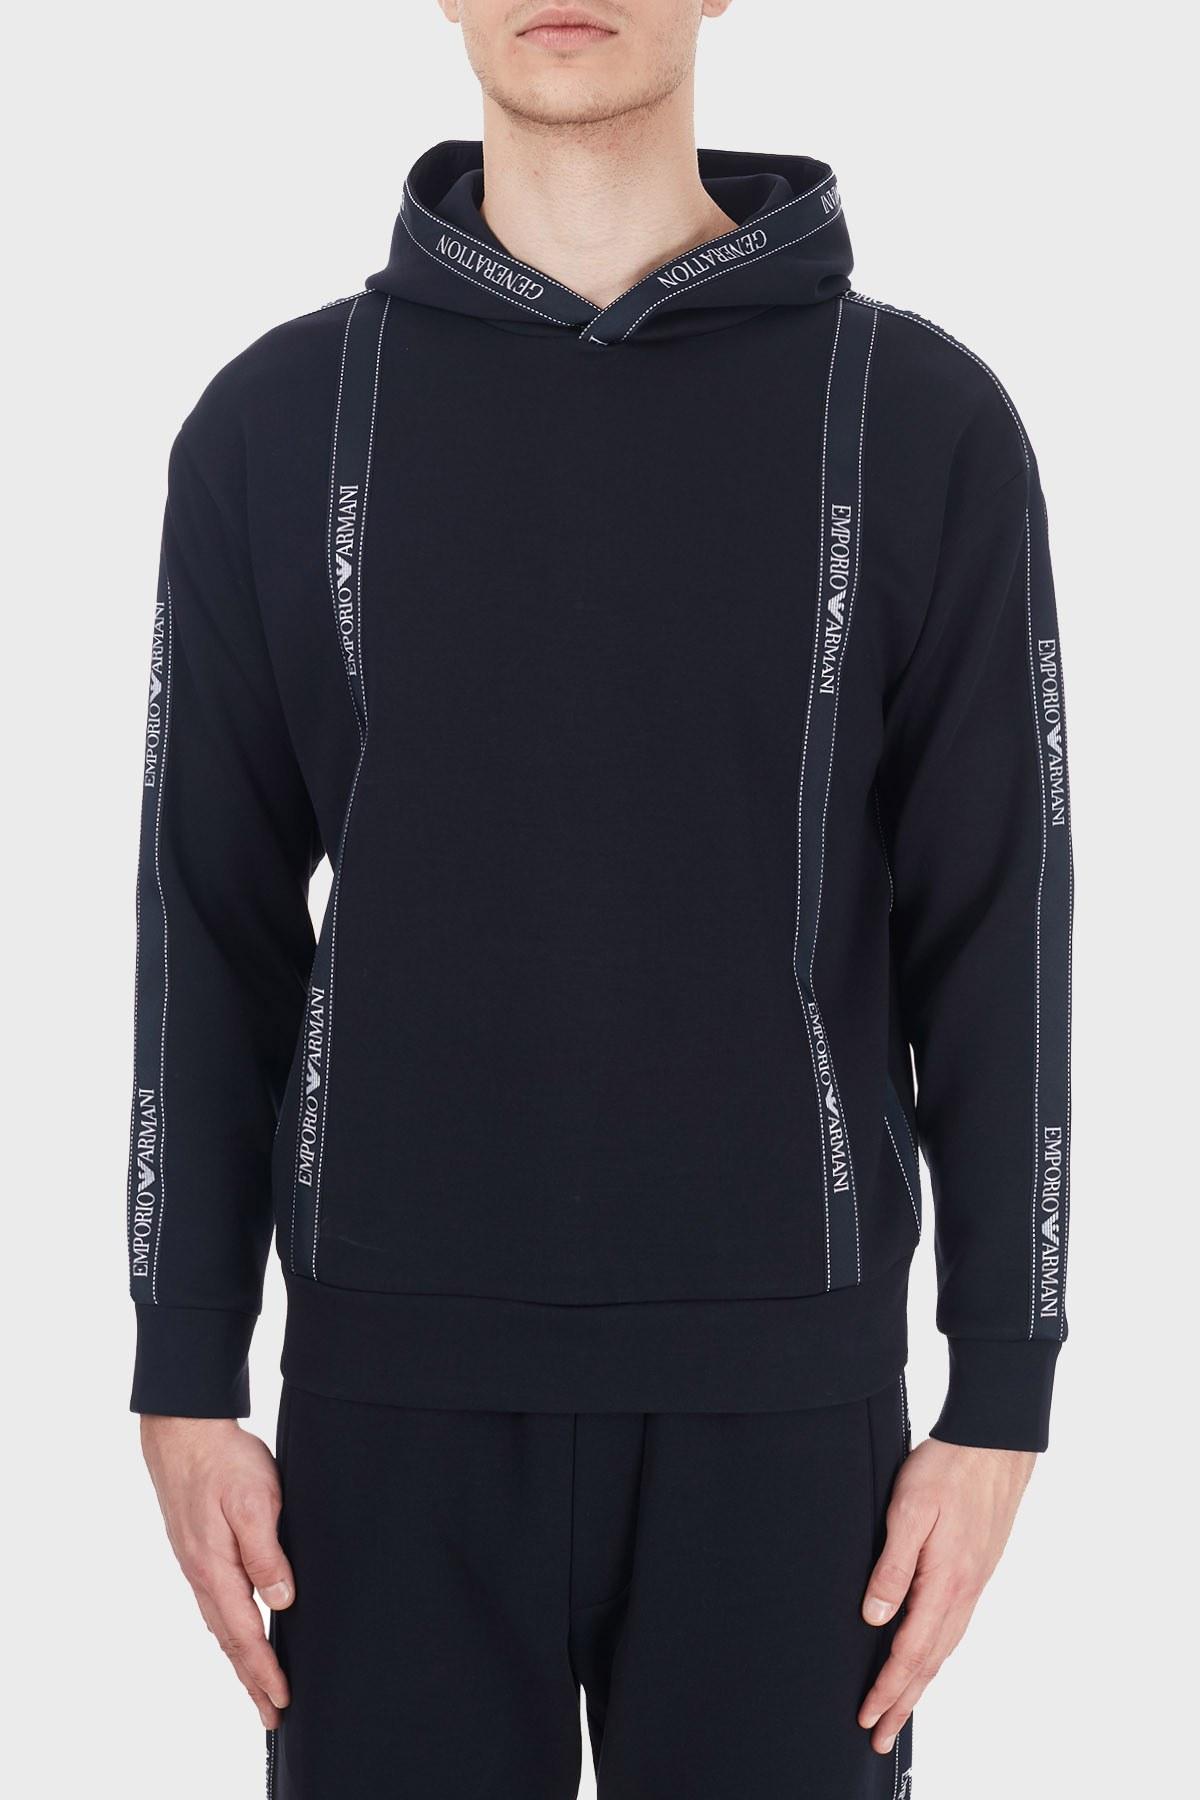 Emporio Armani Logo Bantlı Kapüşonlu Pamuklu Erkek Sweat 6H1M82 1JHSZ 0920 LACİVERT